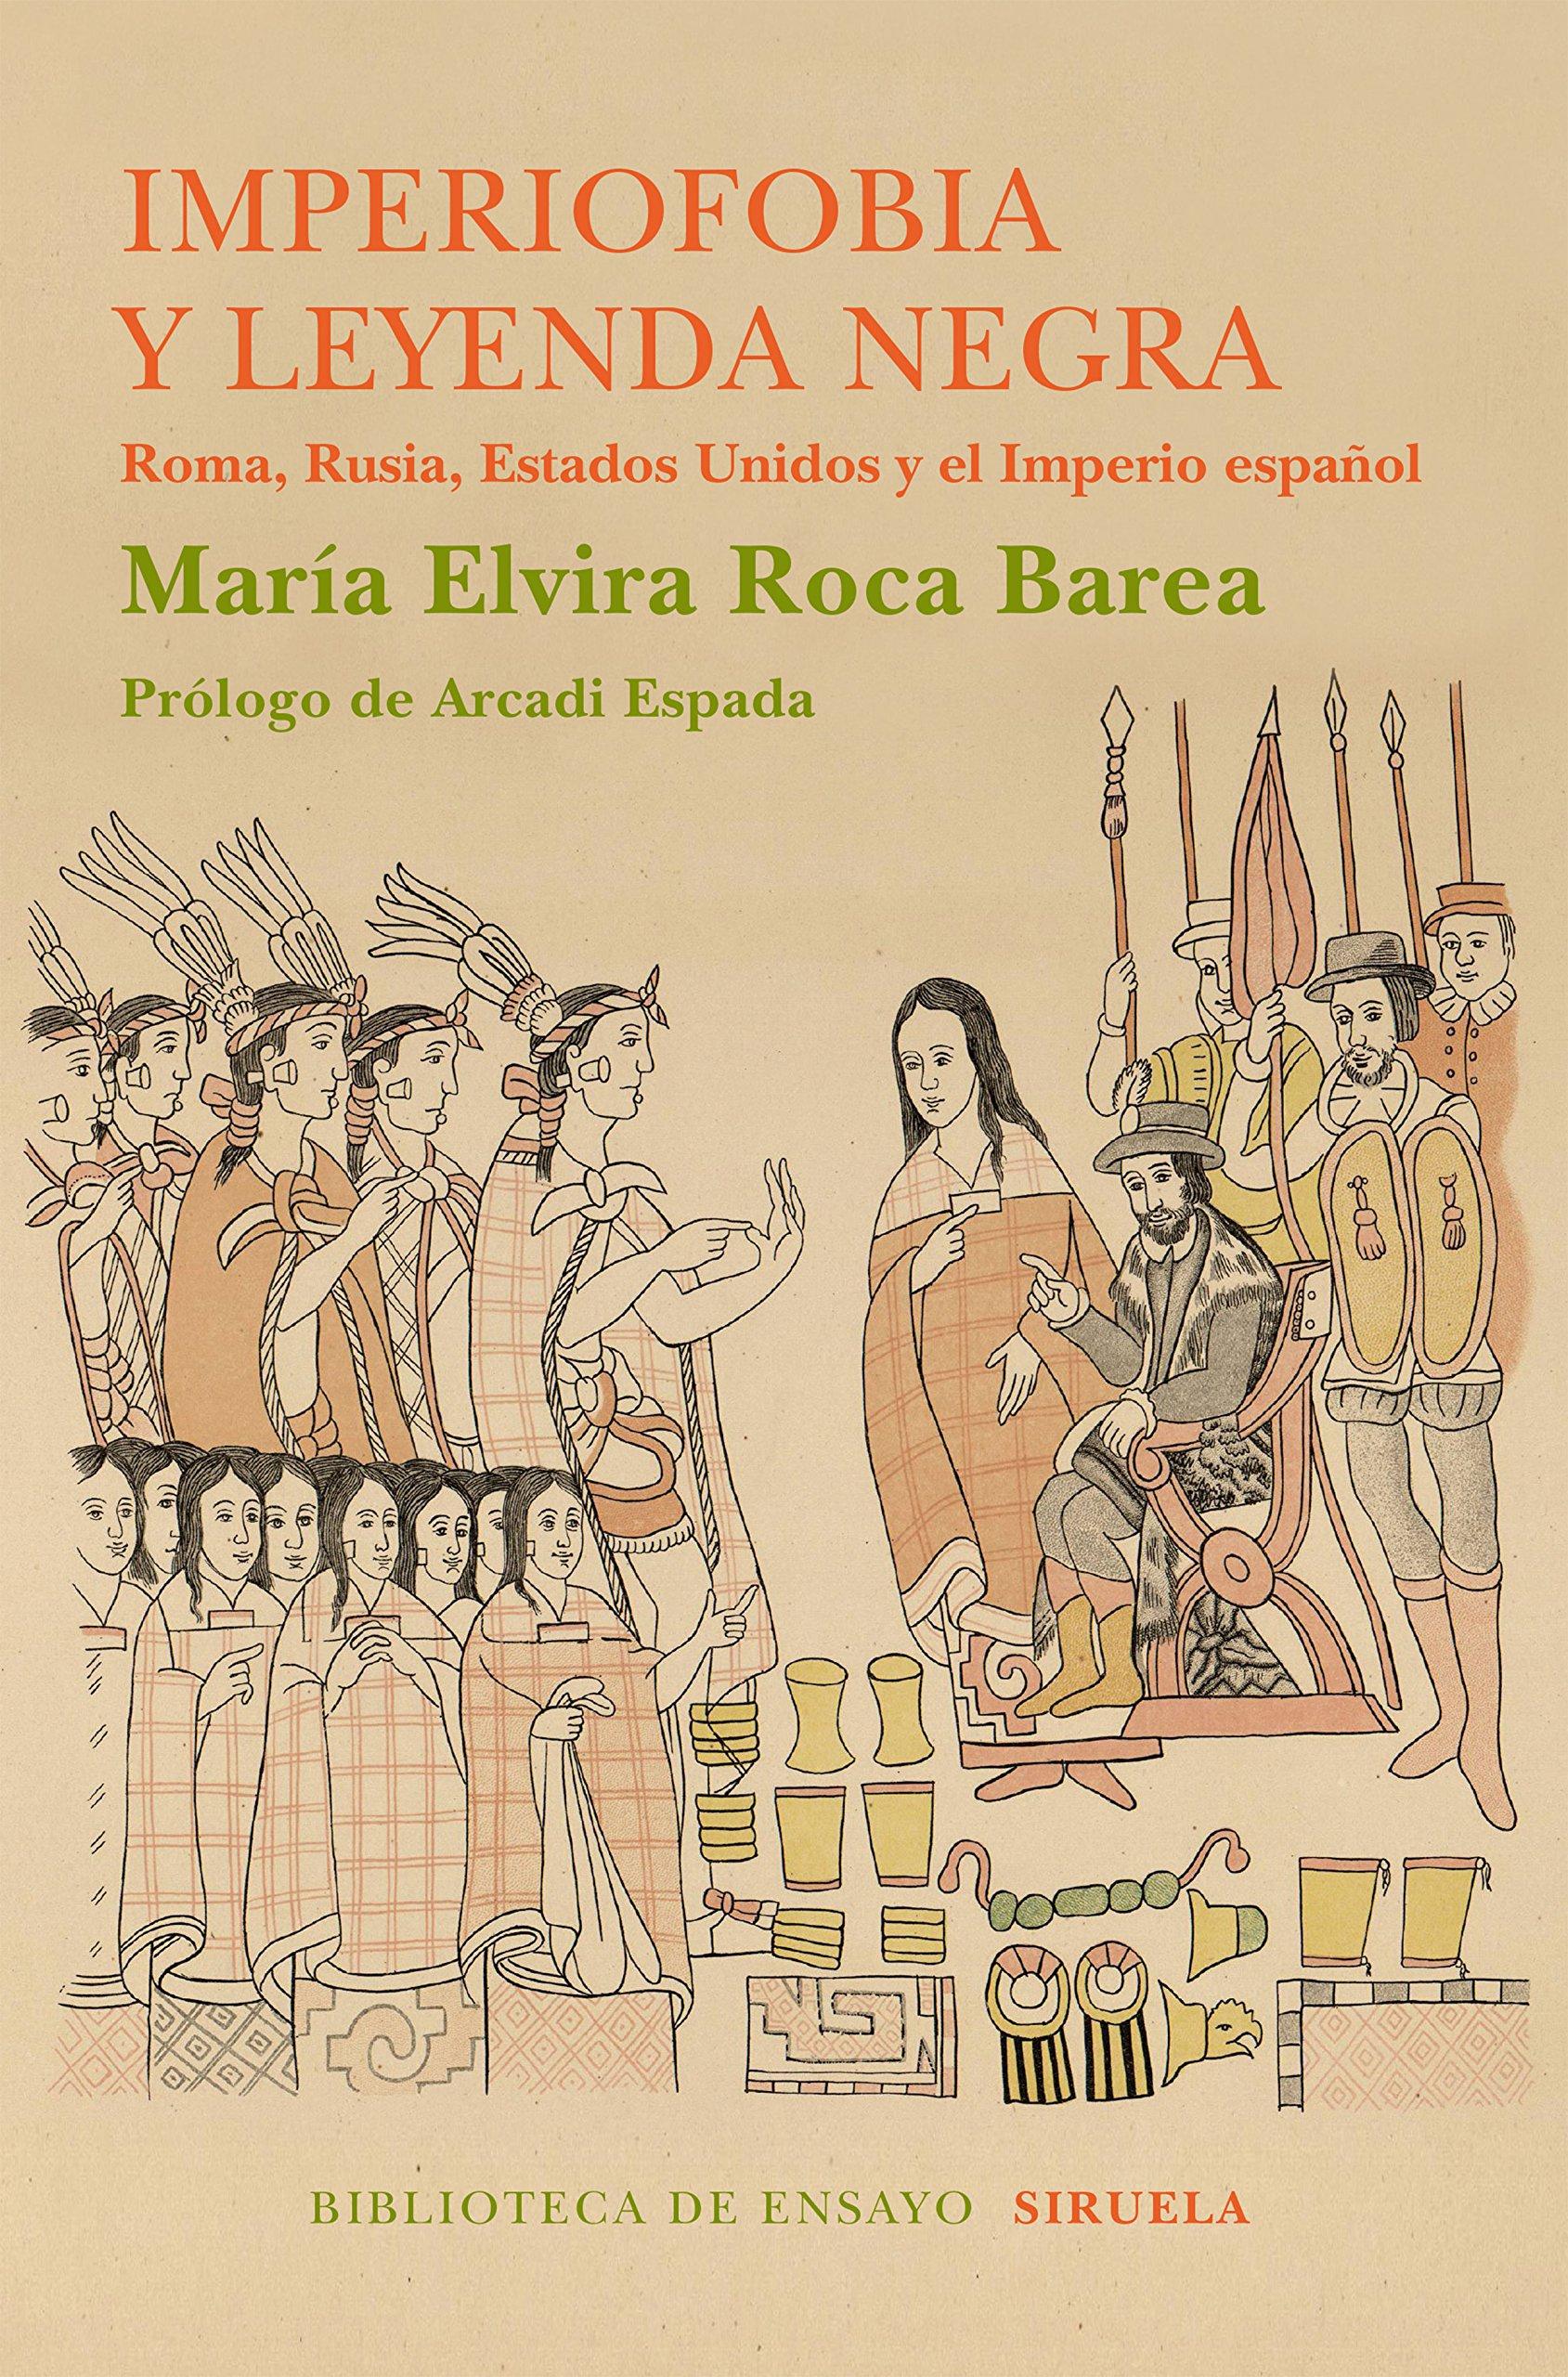 Imperiofobia y la leyenda negra: ROCA BAREA MARIA ELVIRA: 9788416854233: Amazon.com: Books